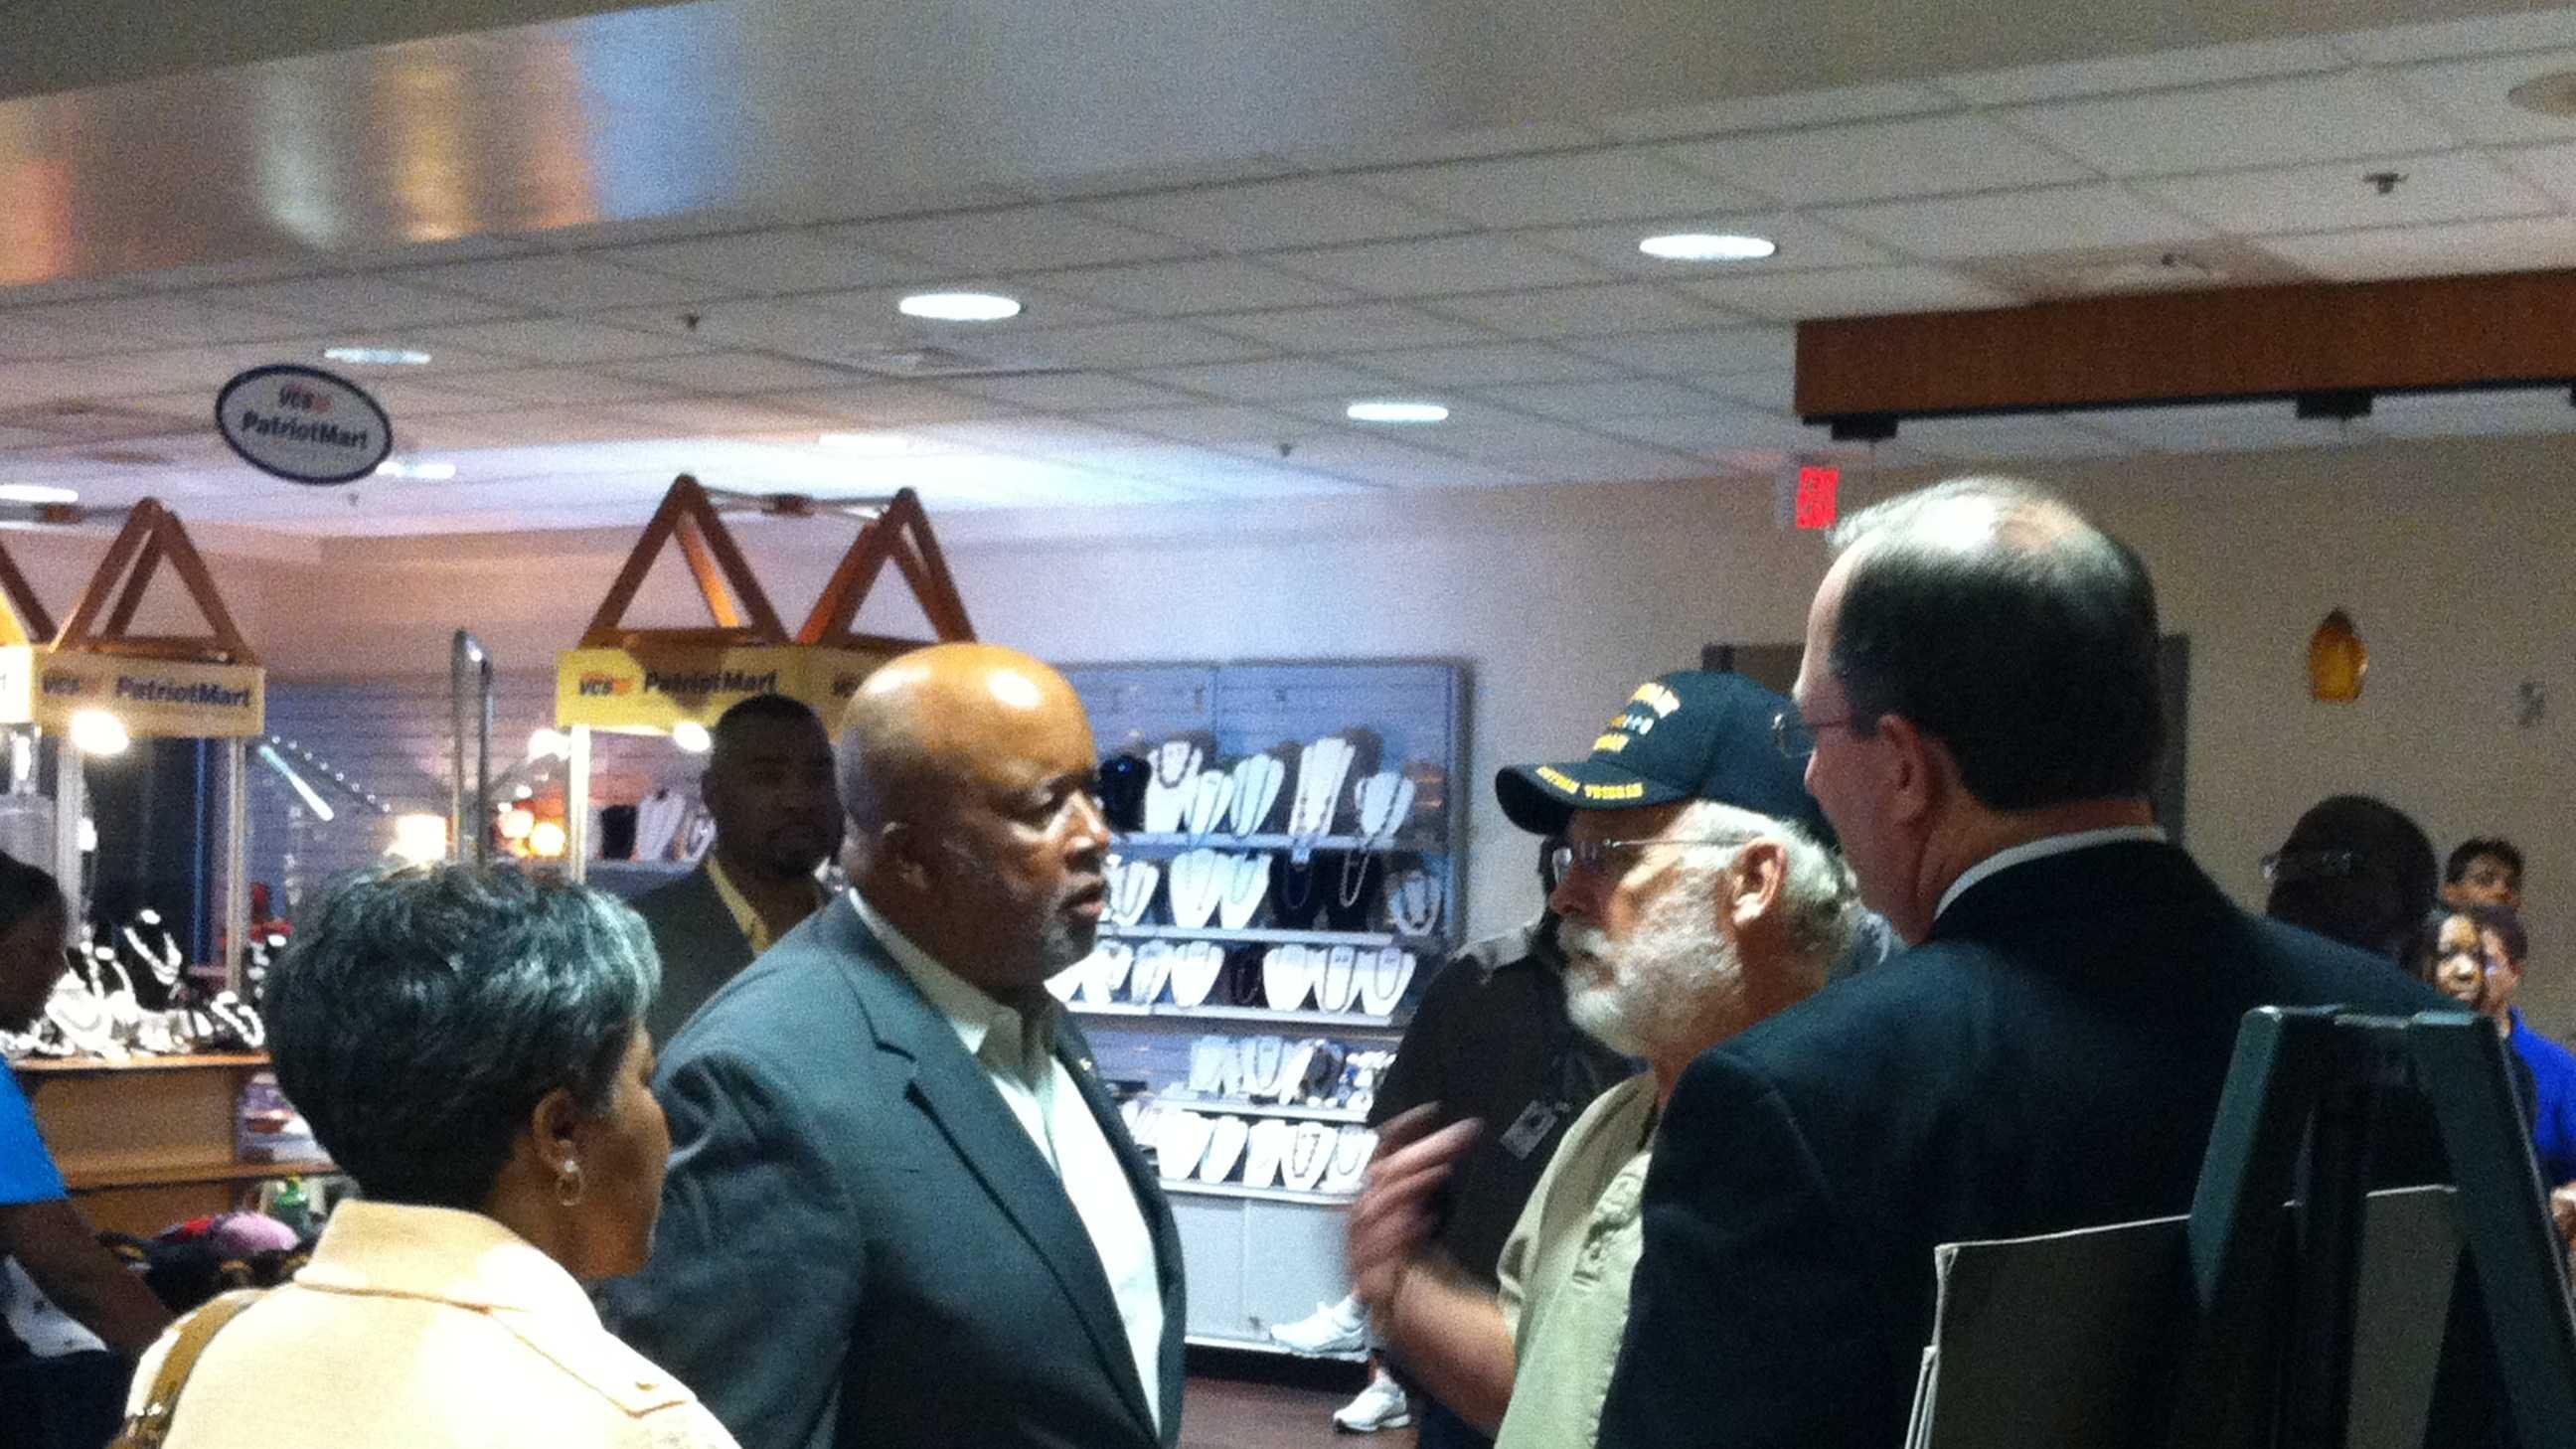 U.S. Rep. Bennie Thompson tours the VA hospital in Jackson.